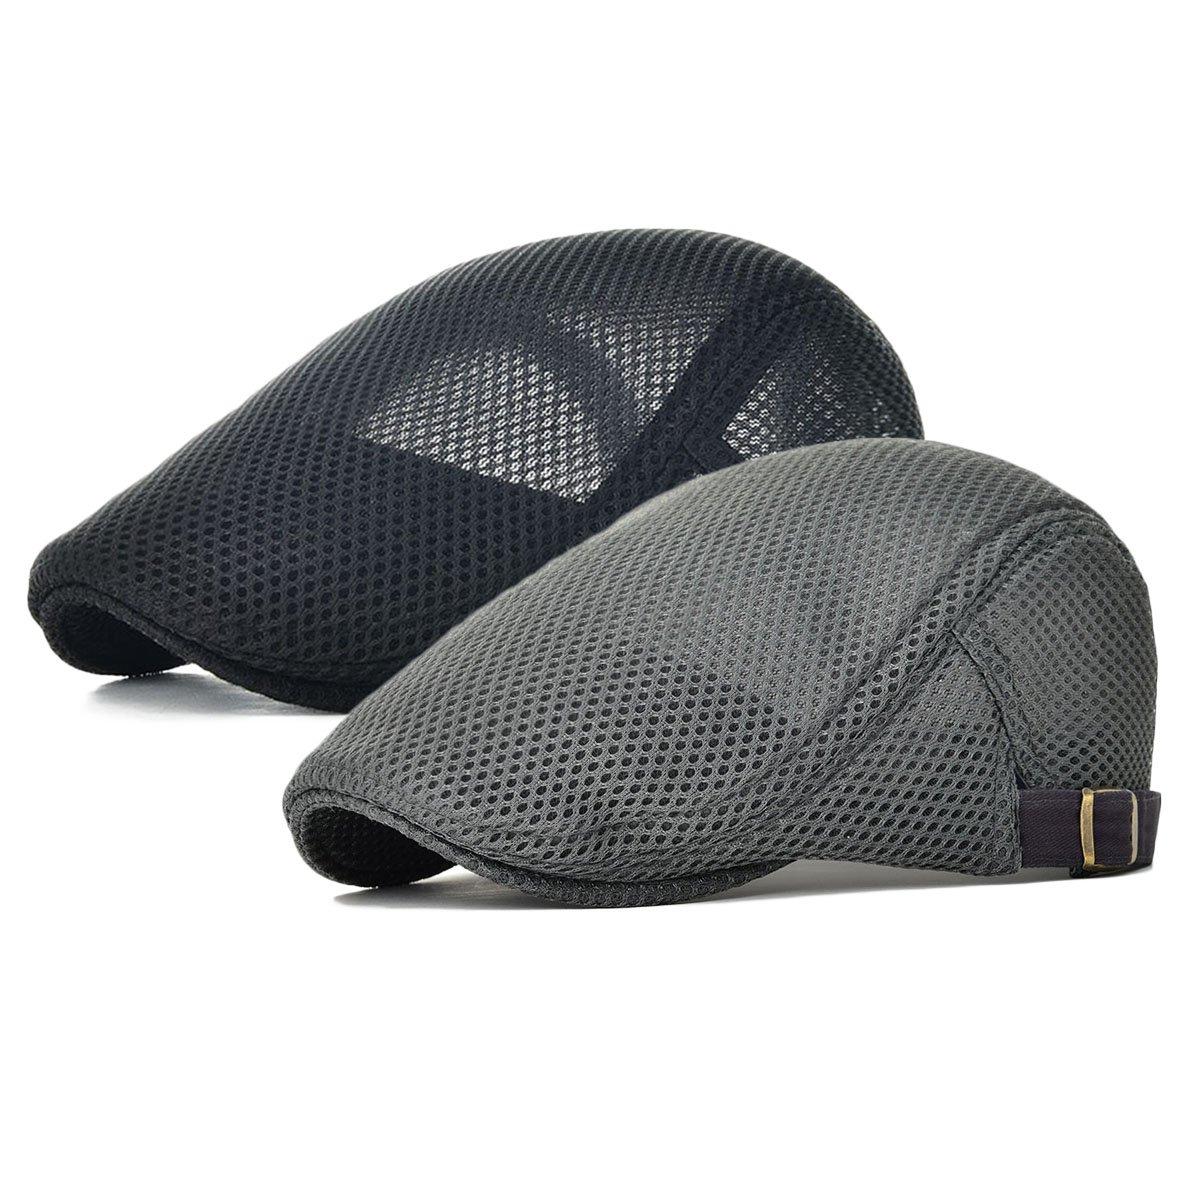 JANGOUL Men's Mesh Flat Cap Duckbill Beret Ivy Gatsby Newsboy Driving Cabbie Caps Hunting Hat (2 Pack-a)